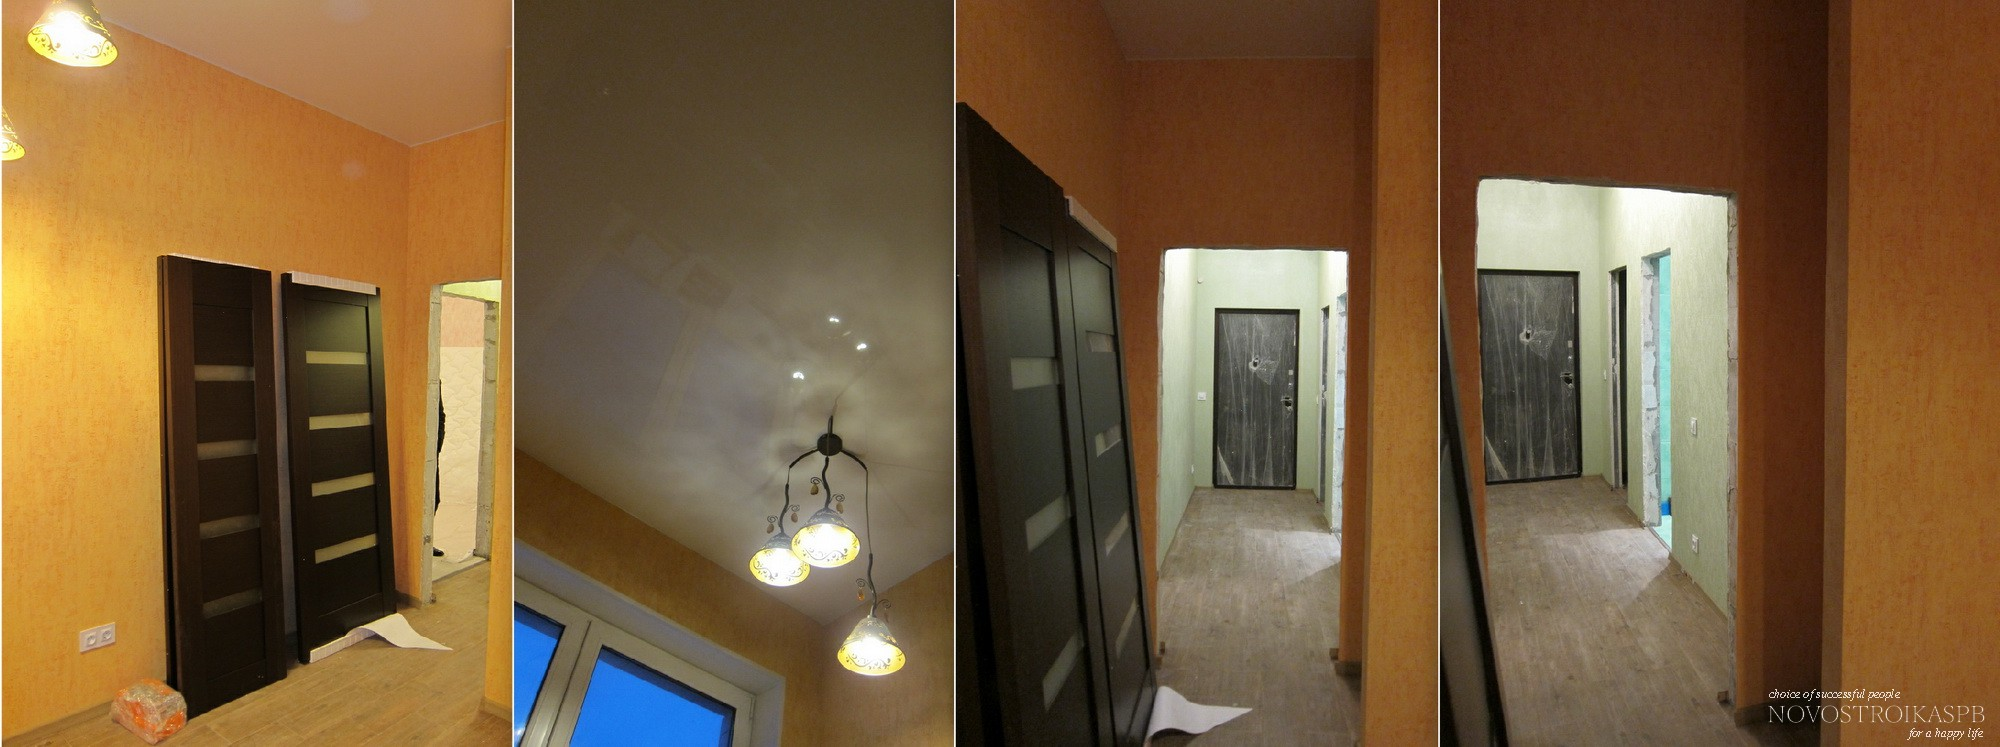 Ремонт квартир в жк доминанта